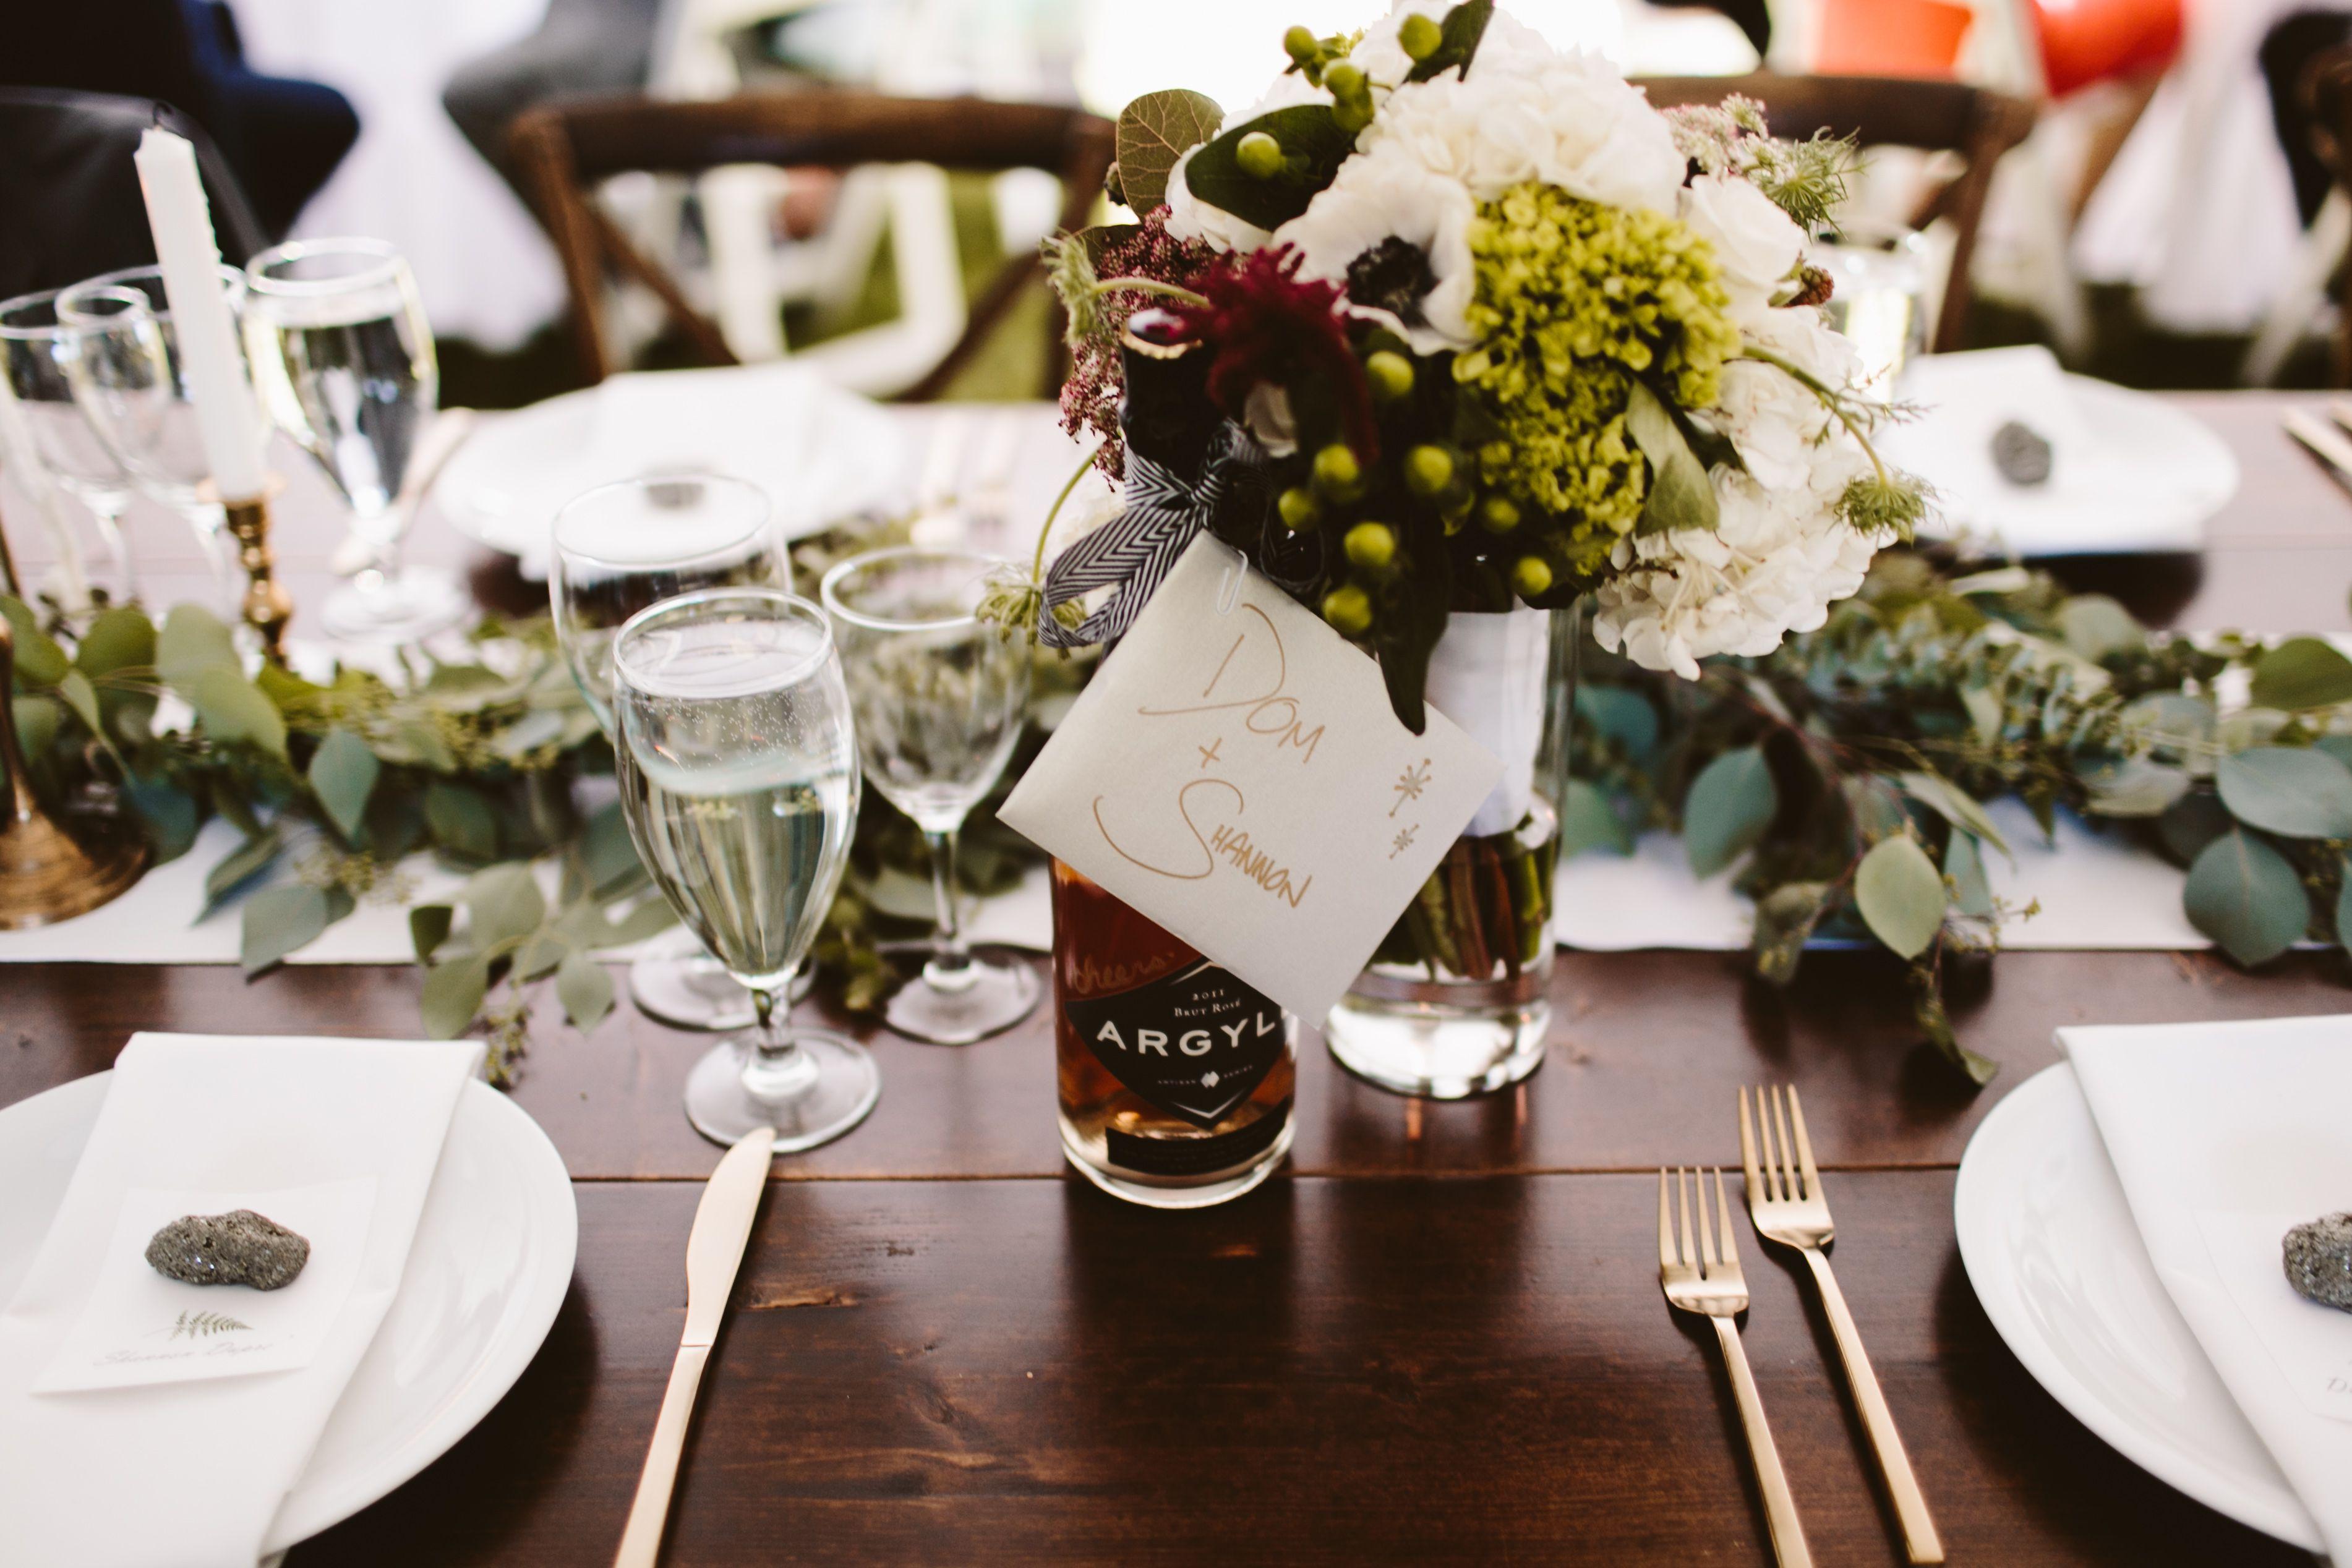 Gold flatware 2017 Wedding Trends photo by Allison Harp ...